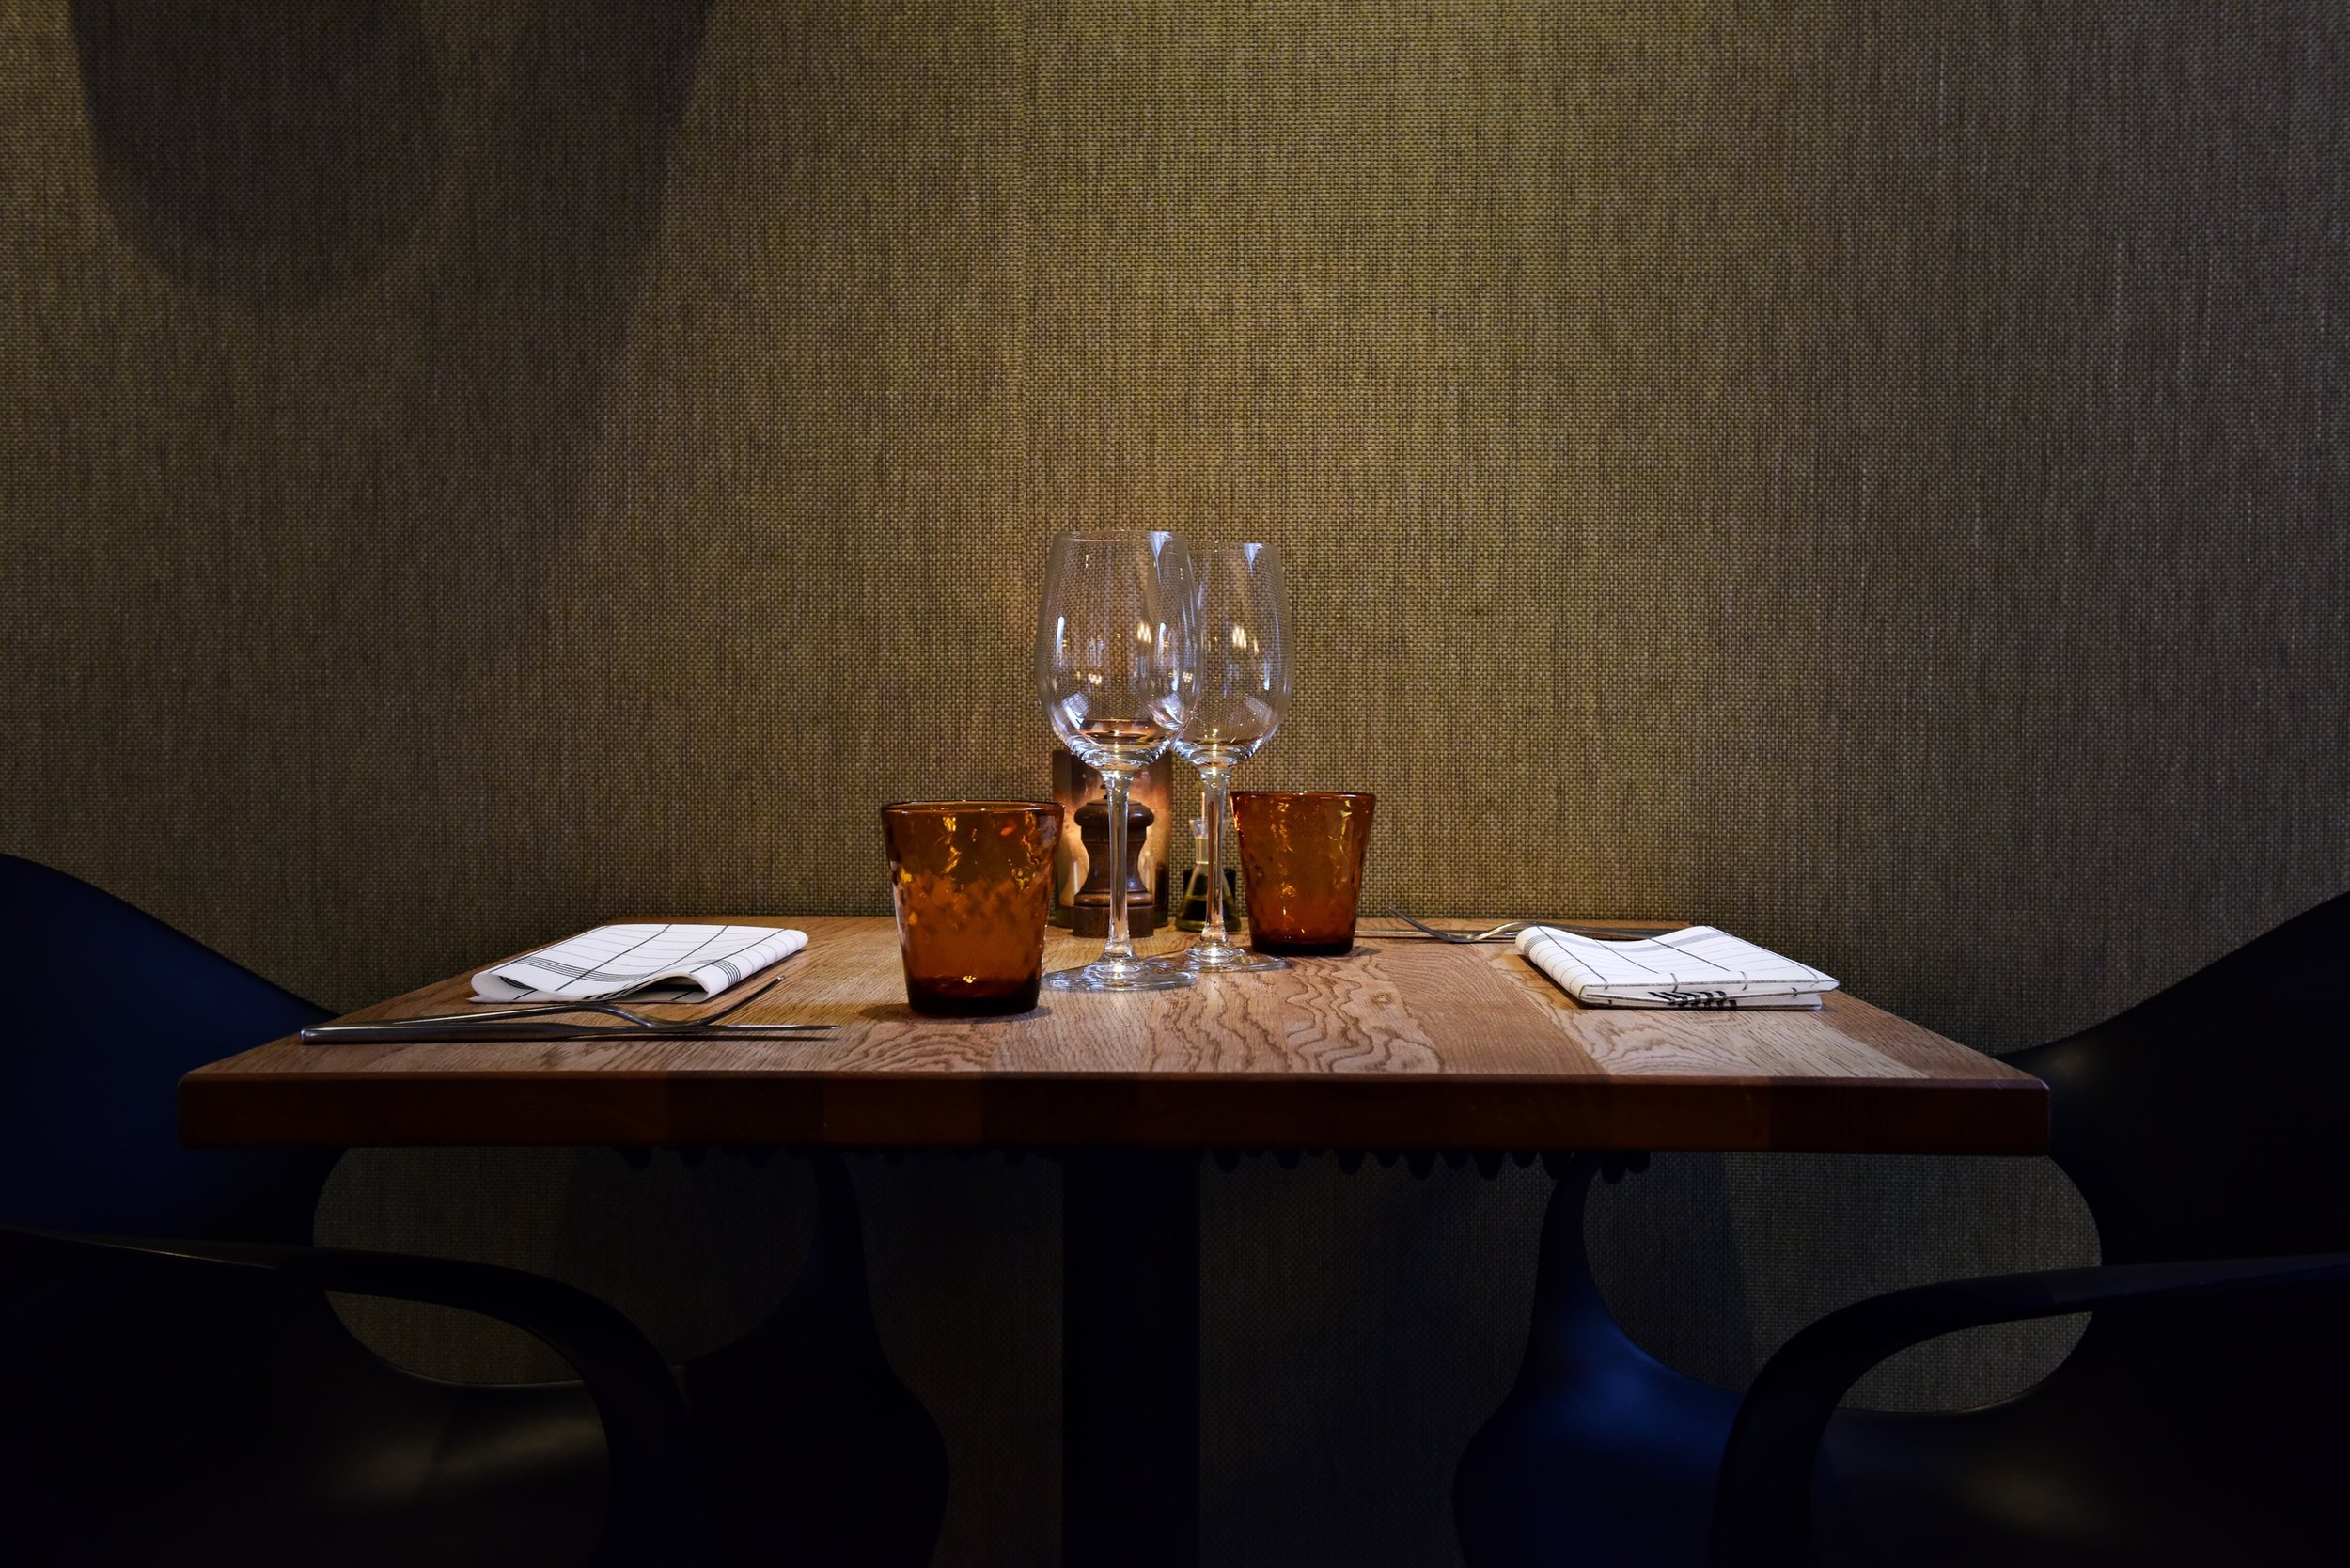 6 brasserie juste restaurant Dikkelvenne tablefever bart albrecht culinair fotograaf foodfotograaf.jpg